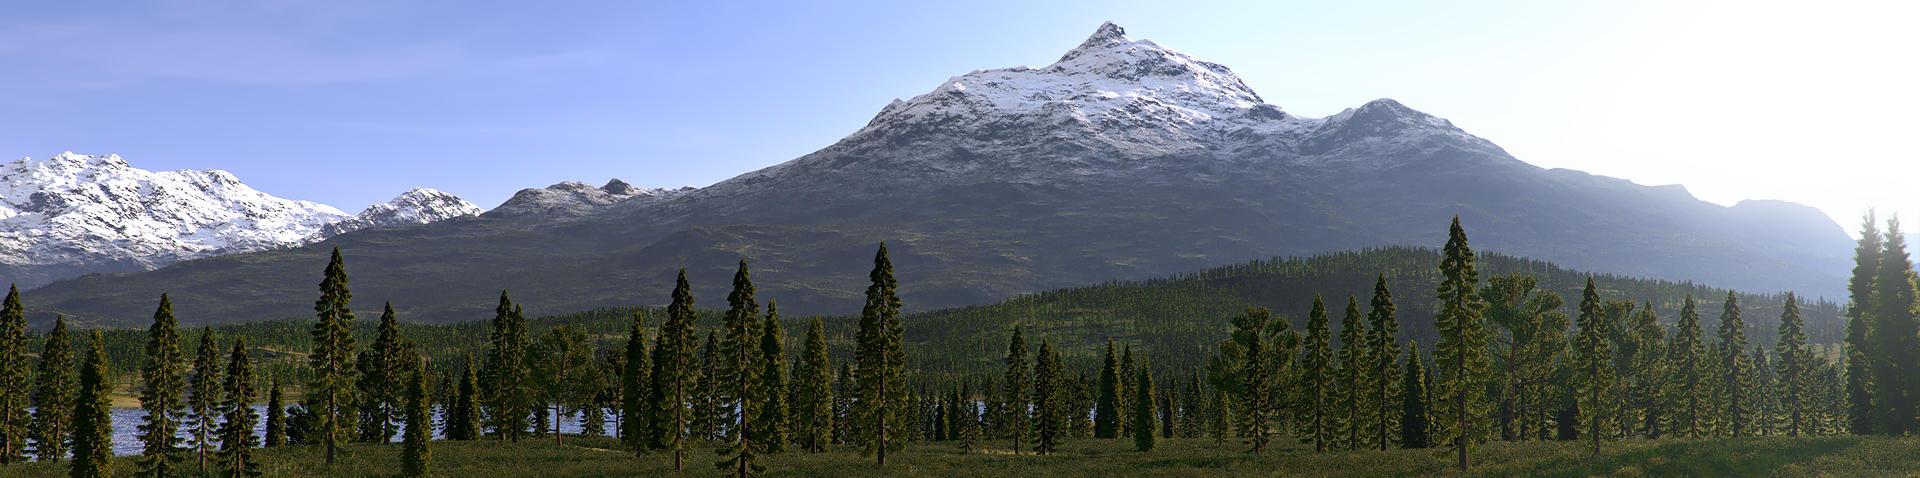 Kite Peak by villekroger